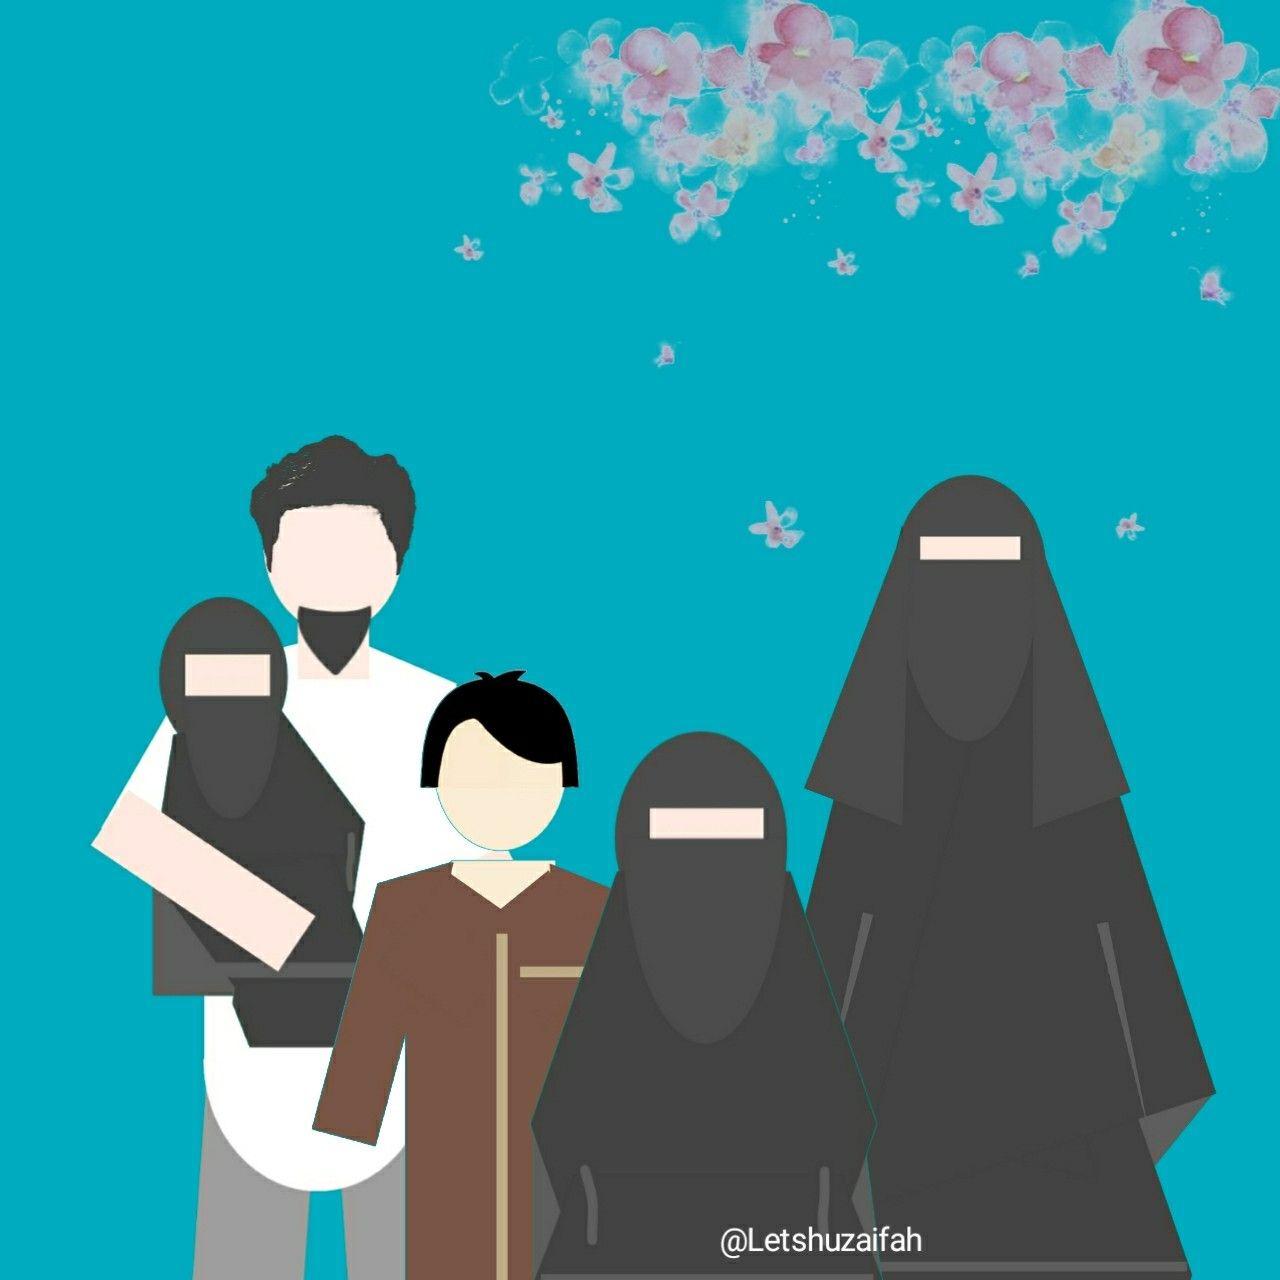 35 Trend Terbaru Kartun Keluarga Muslim Bercadar Mopppy